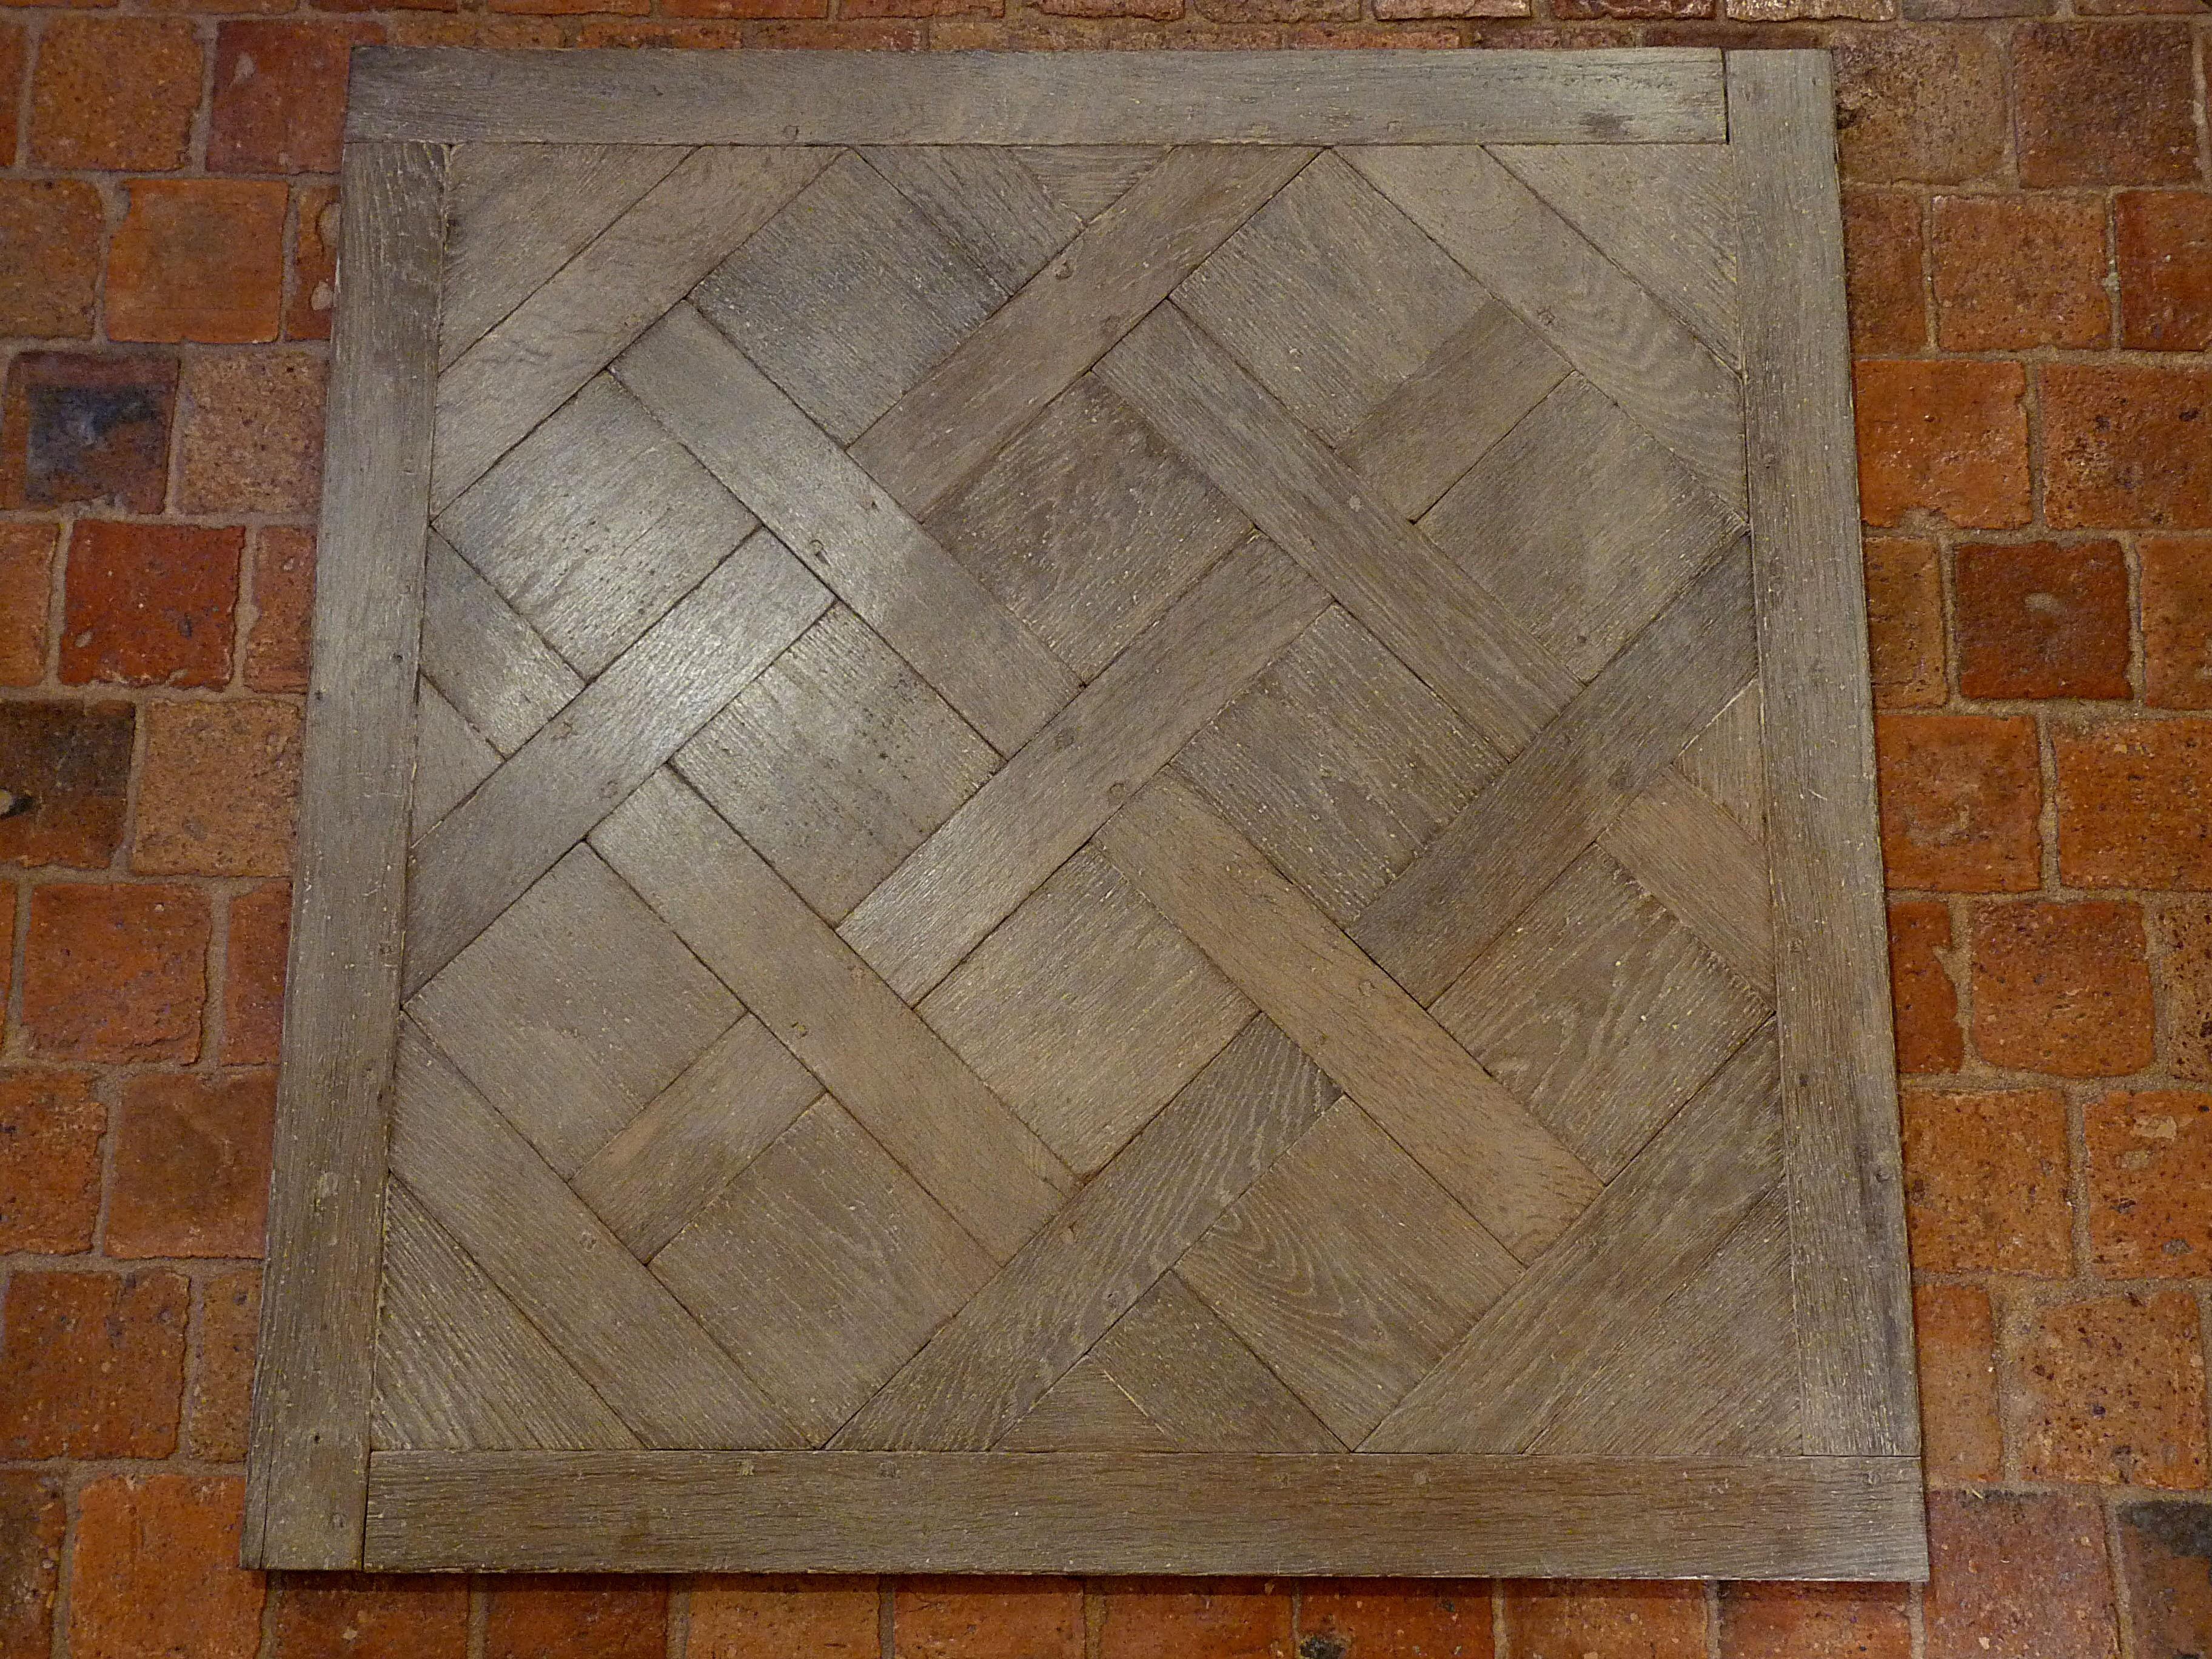 panels_49080_5